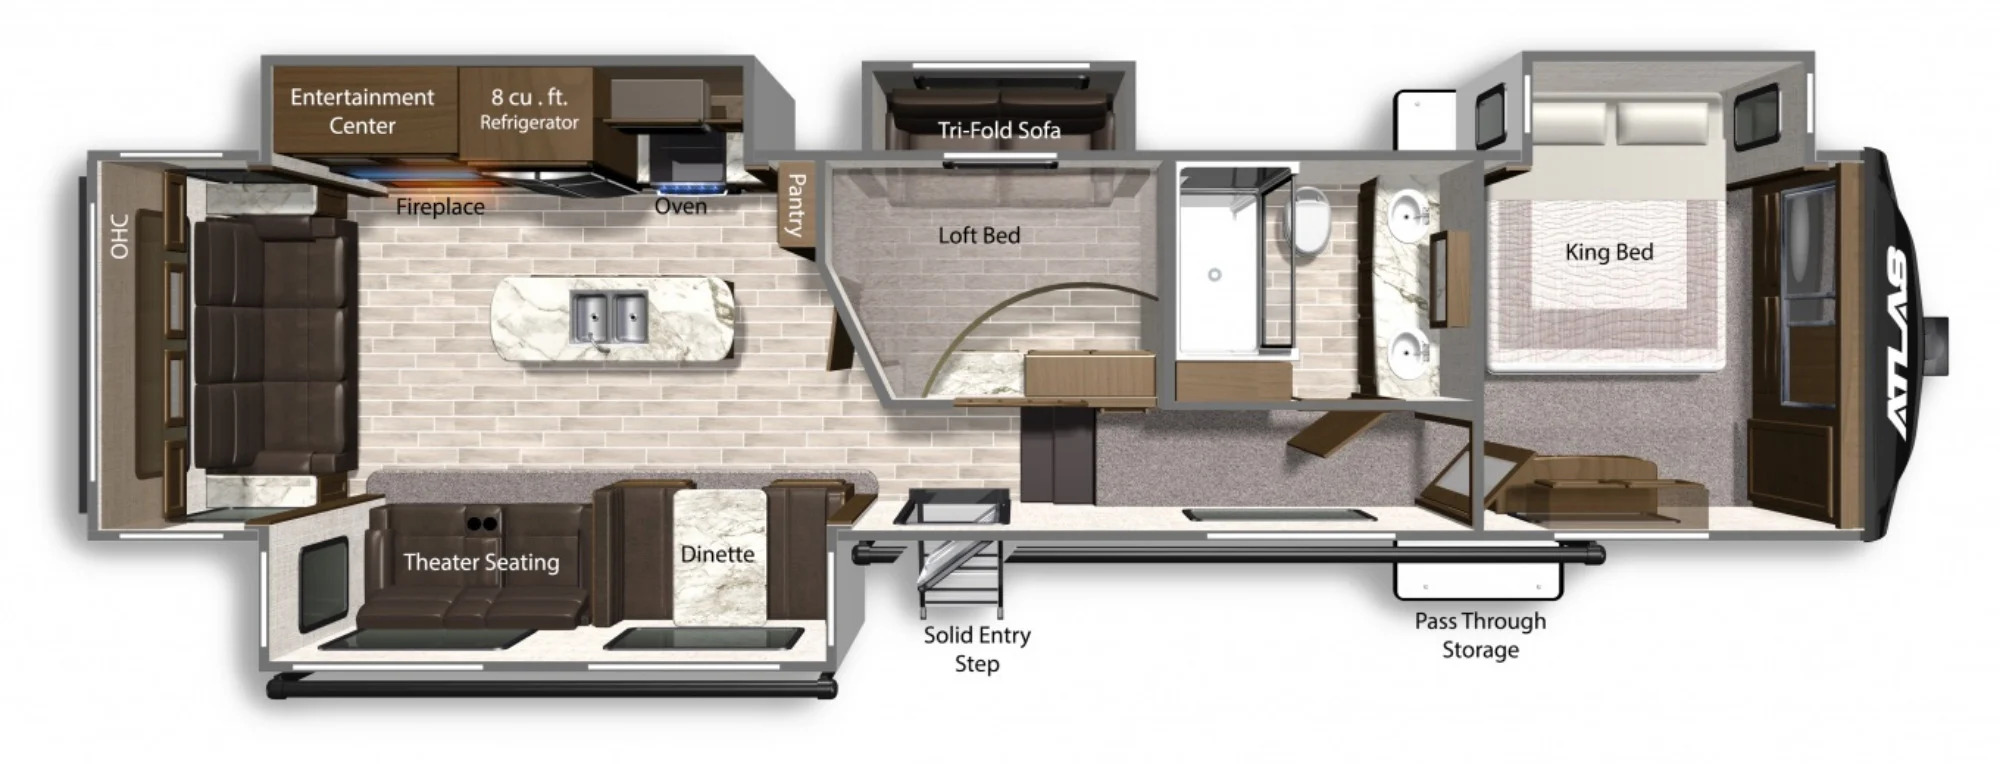 View Floor Plan for 2022 DUTCHMEN ATLAS 3552MBKB